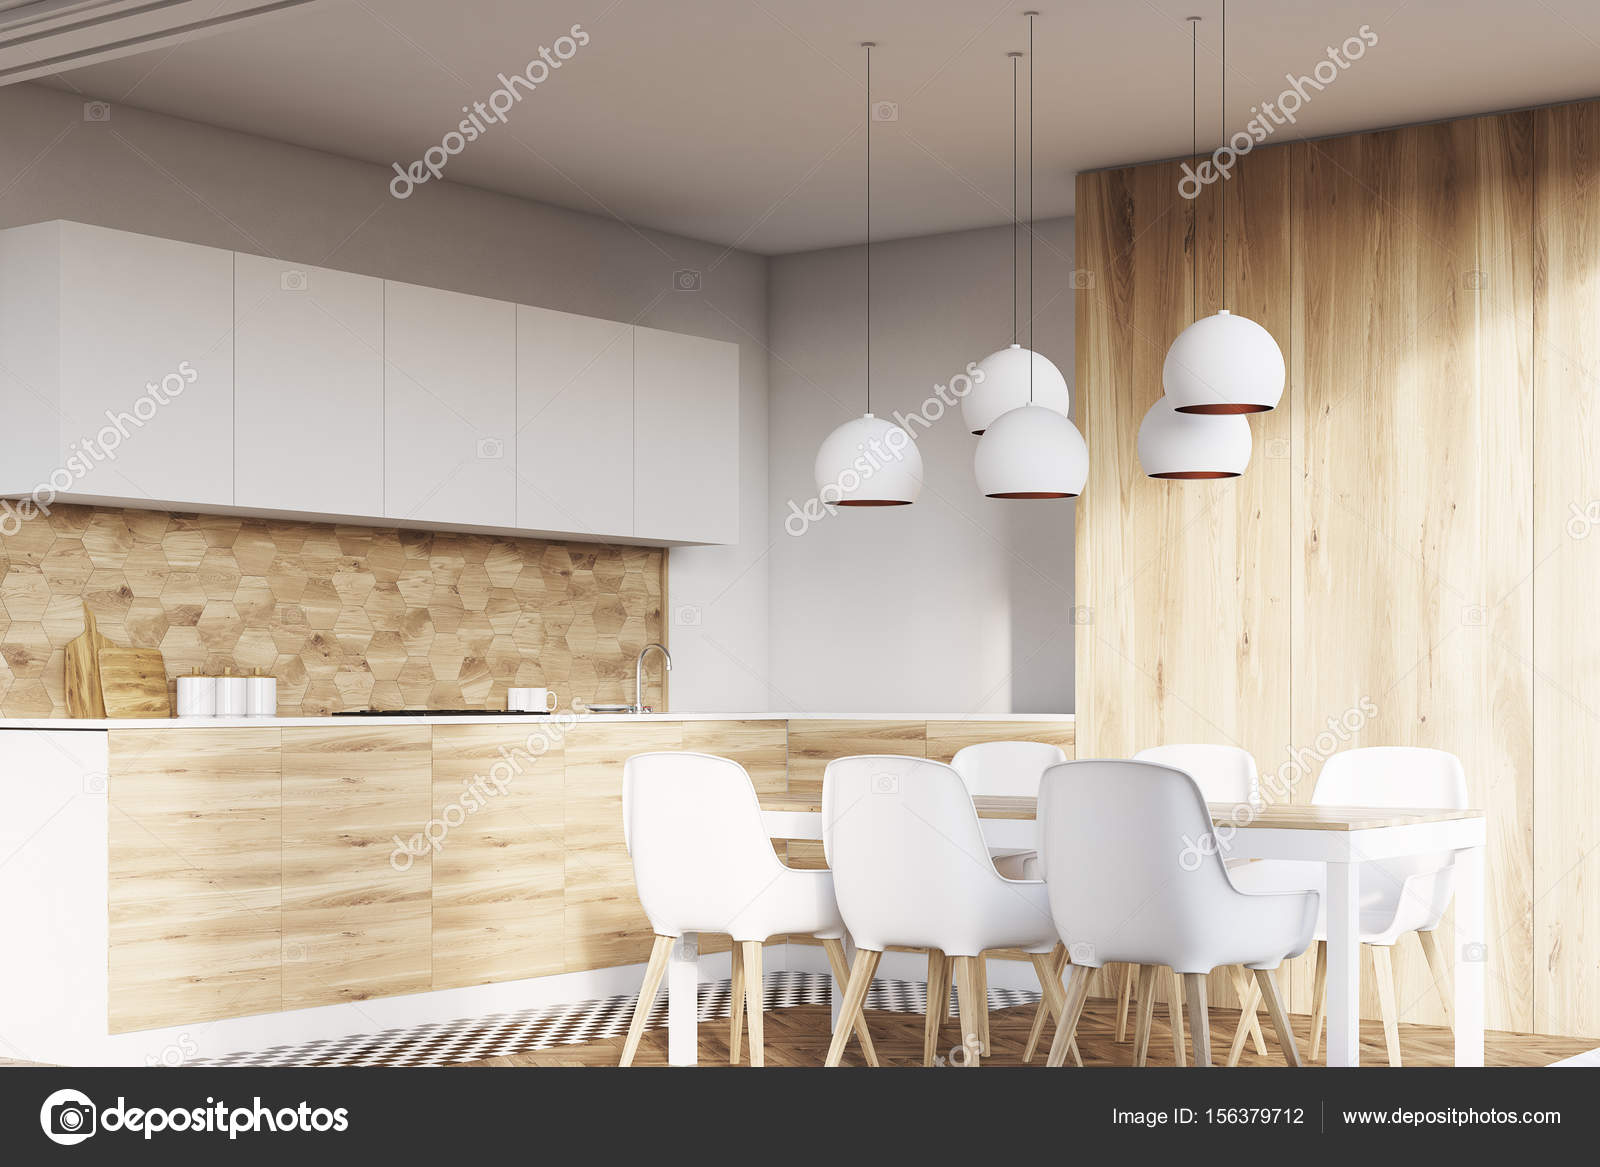 kitchen table nook pull out faucet 轻木餐厅角落 图库照片 c denisismagilov 156379712 与白色的墙壁和木地板的轻木厨房室内的角落 白色的椅子和台面餐桌 3d 渲染小样 照片作者denisismagilov